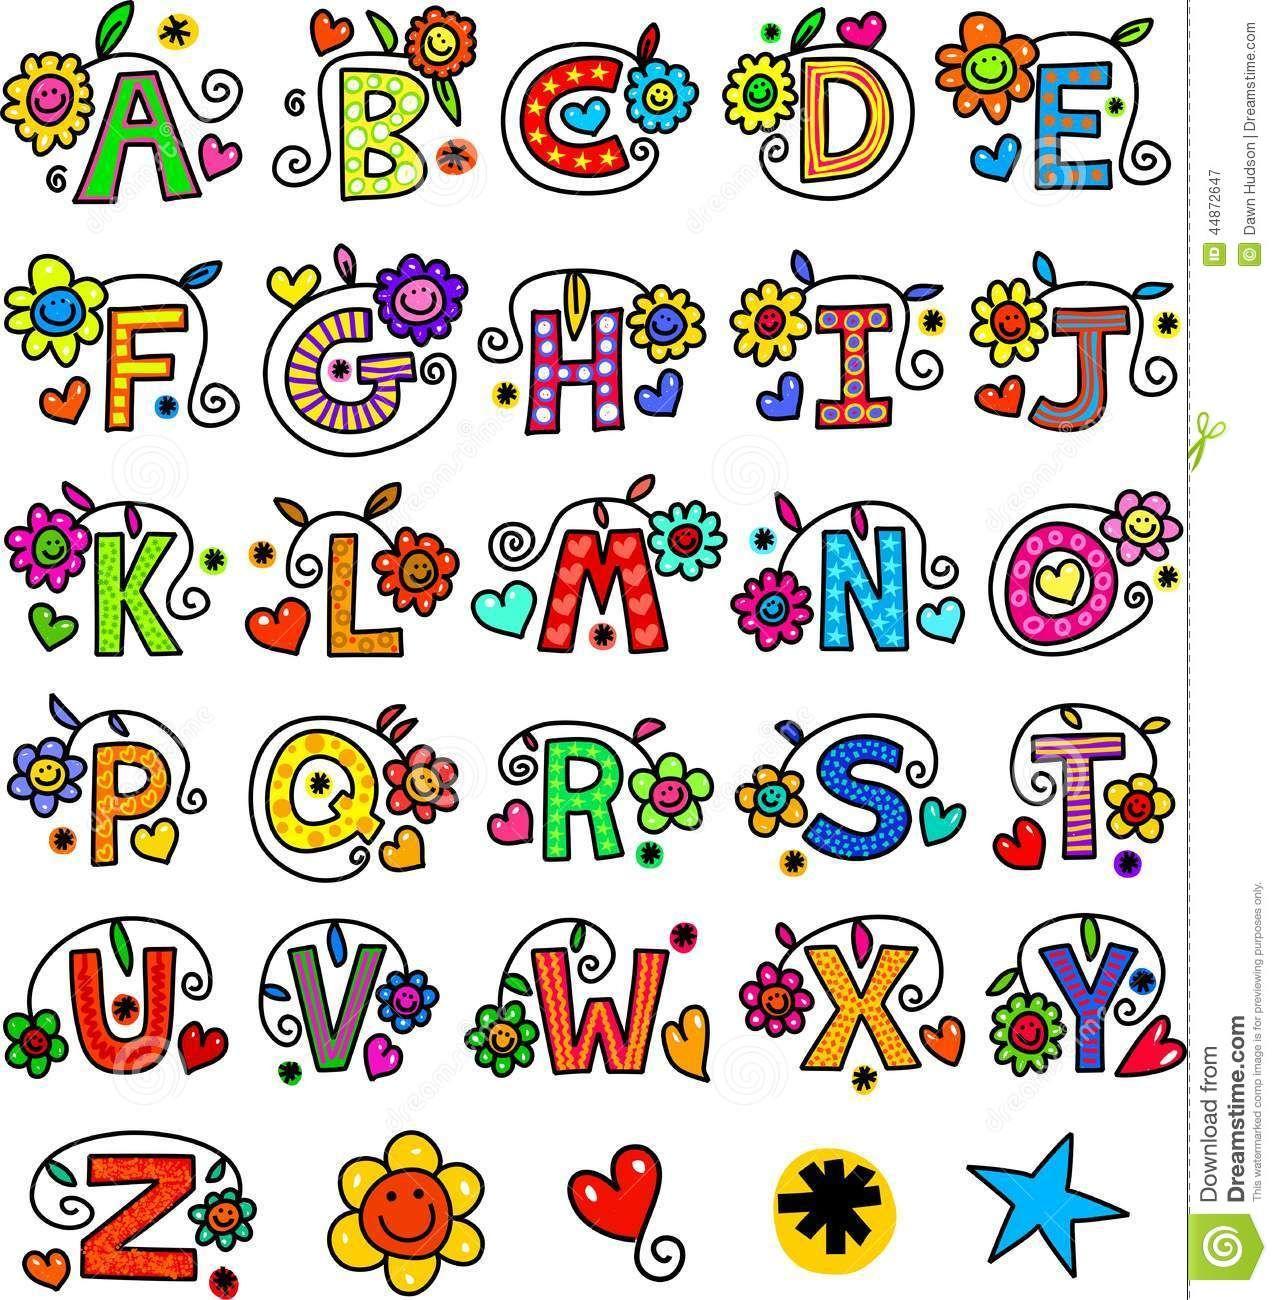 Whimsical Lettering